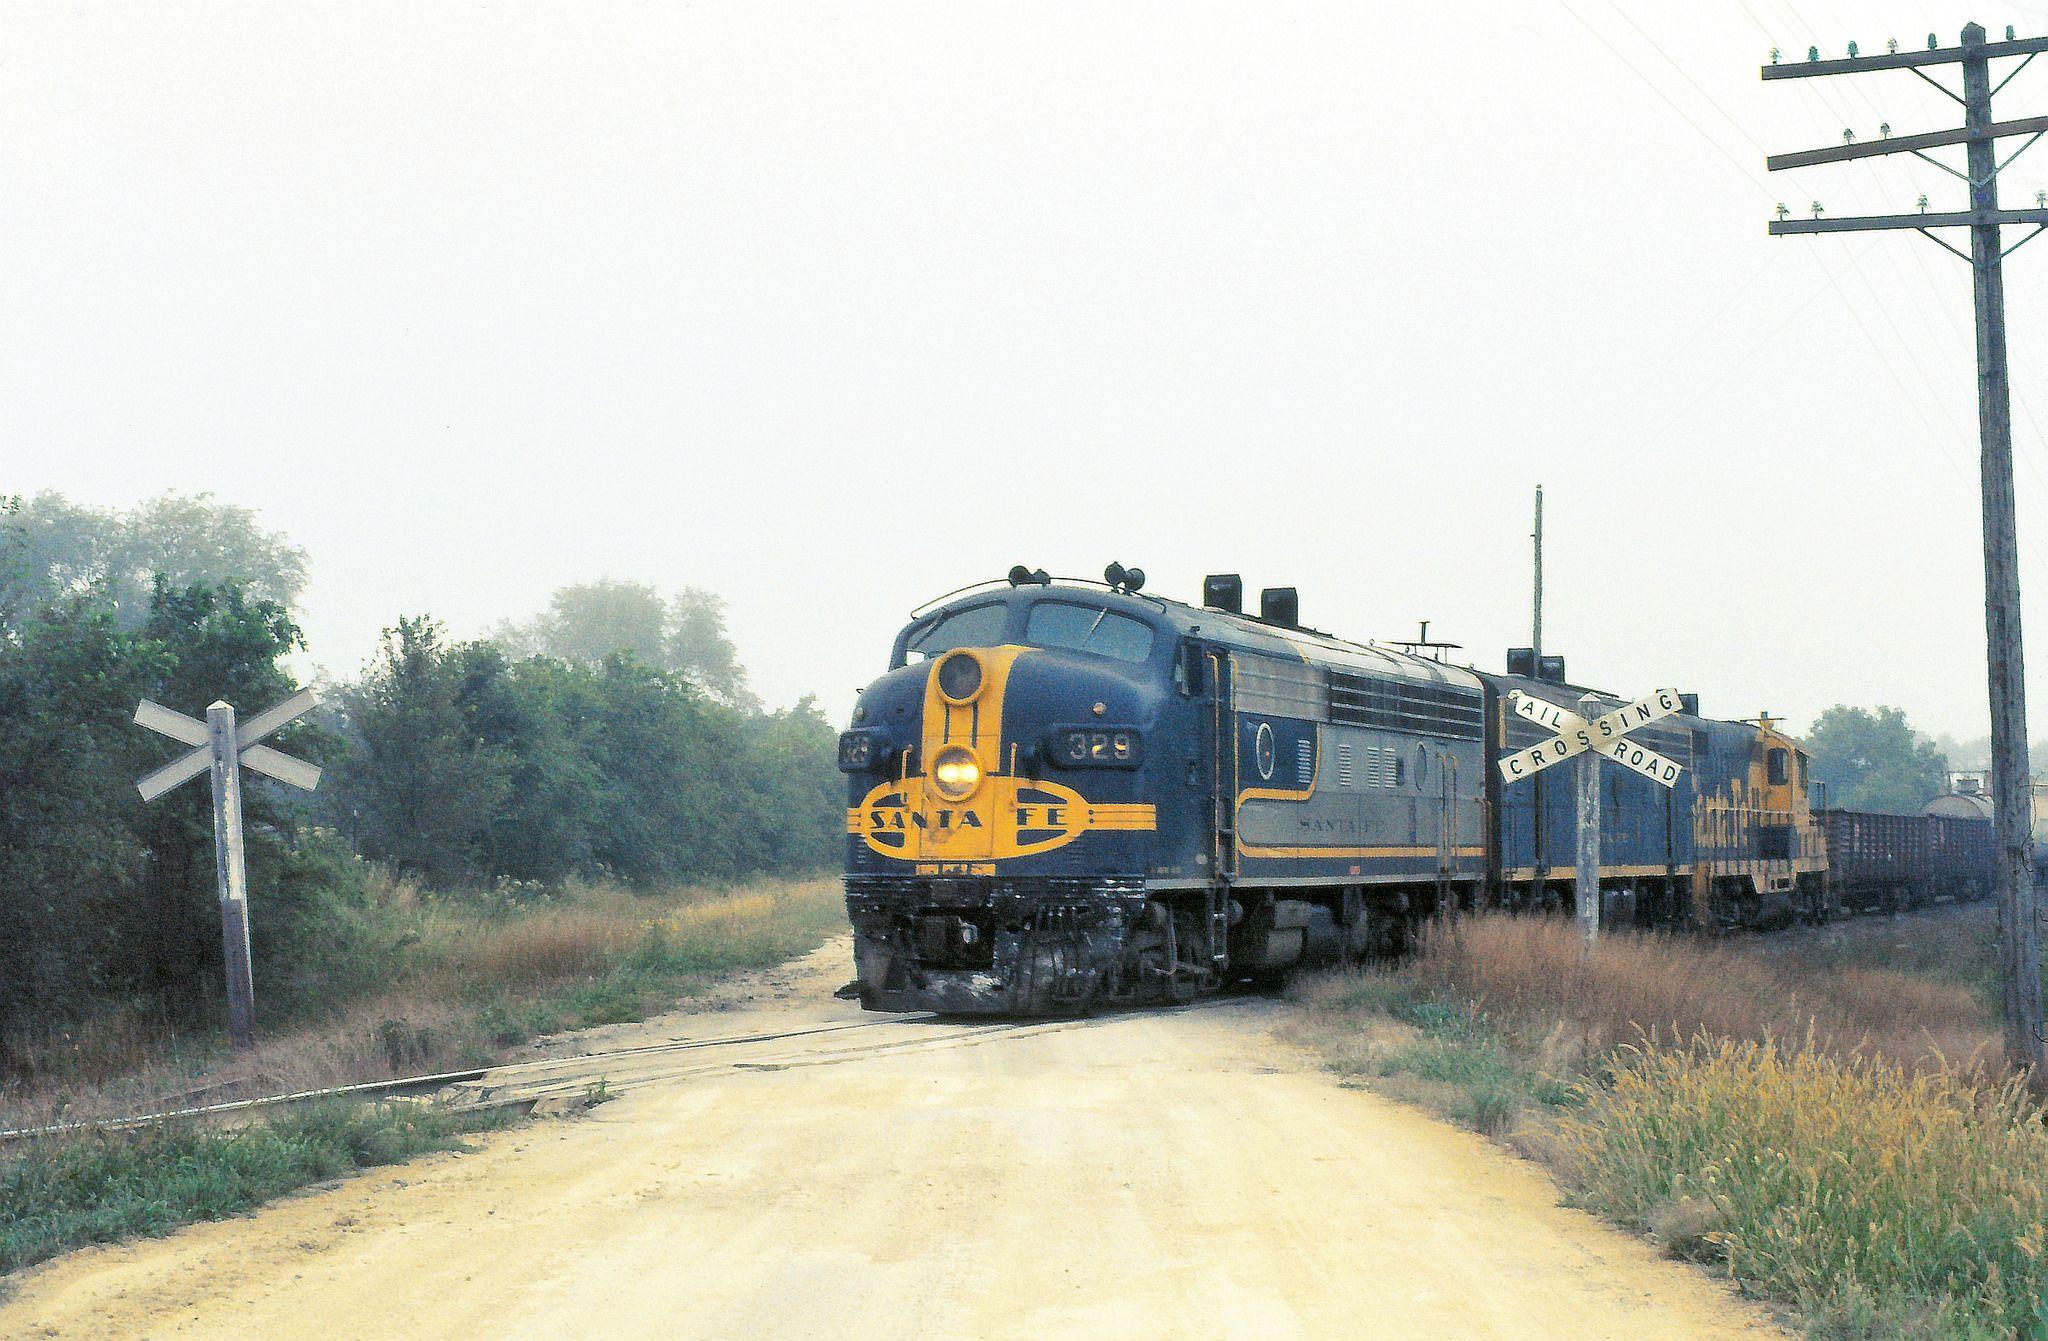 Santa Fe Railway Bluebonnet F7 On A Kansas Branchline 1973 Train Railroad Photography Train Pictures